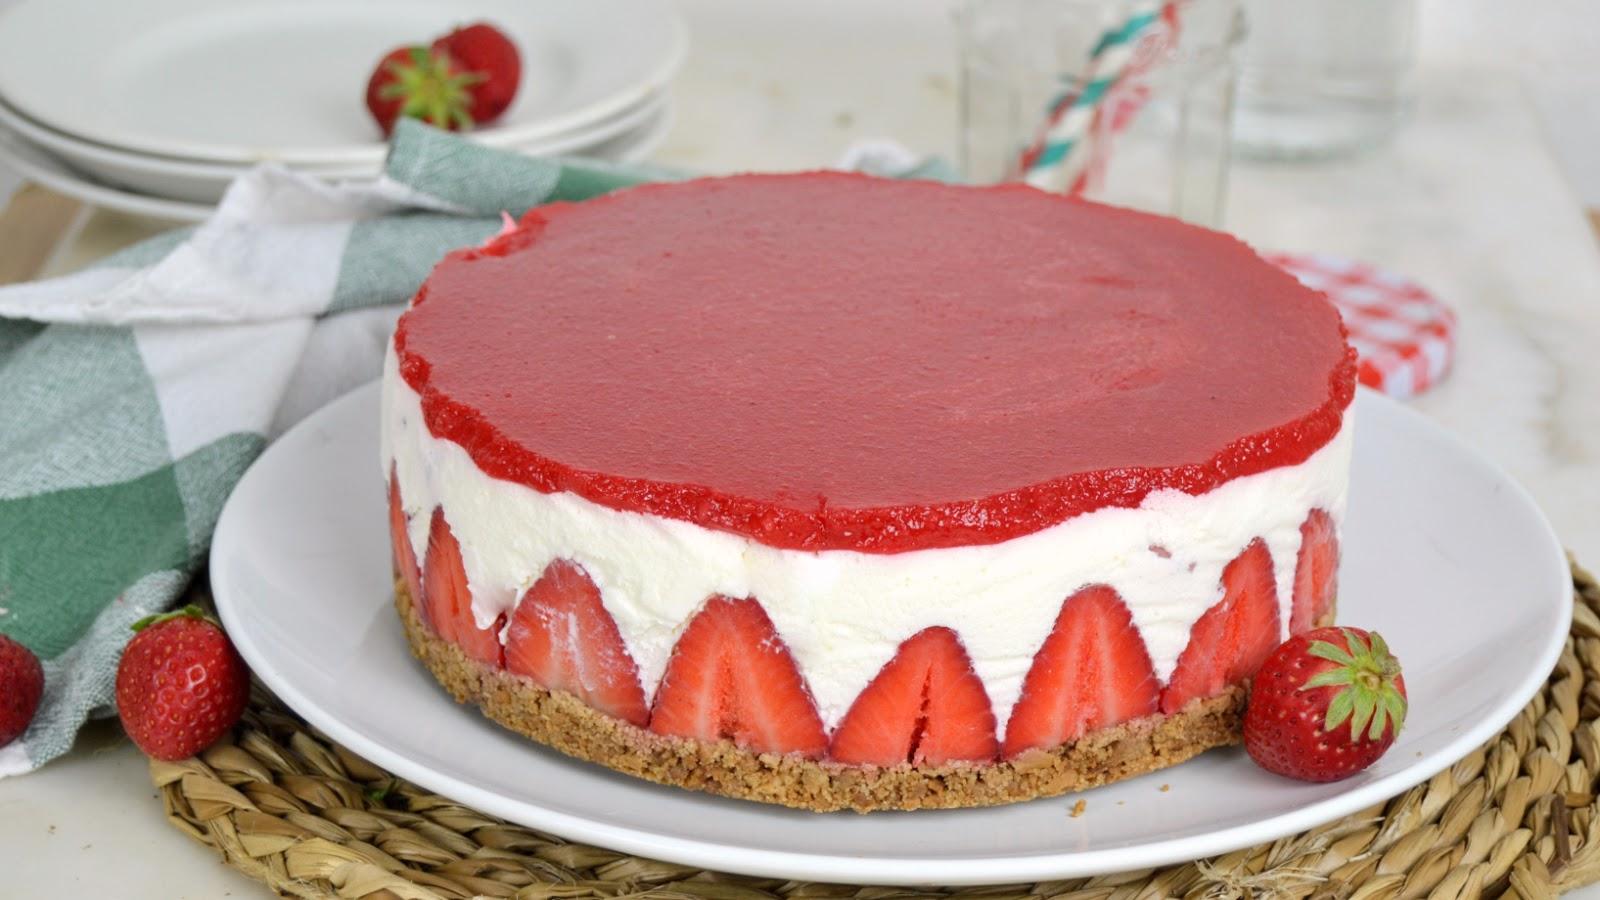 Tarta de queso y fresas estilo fraisier